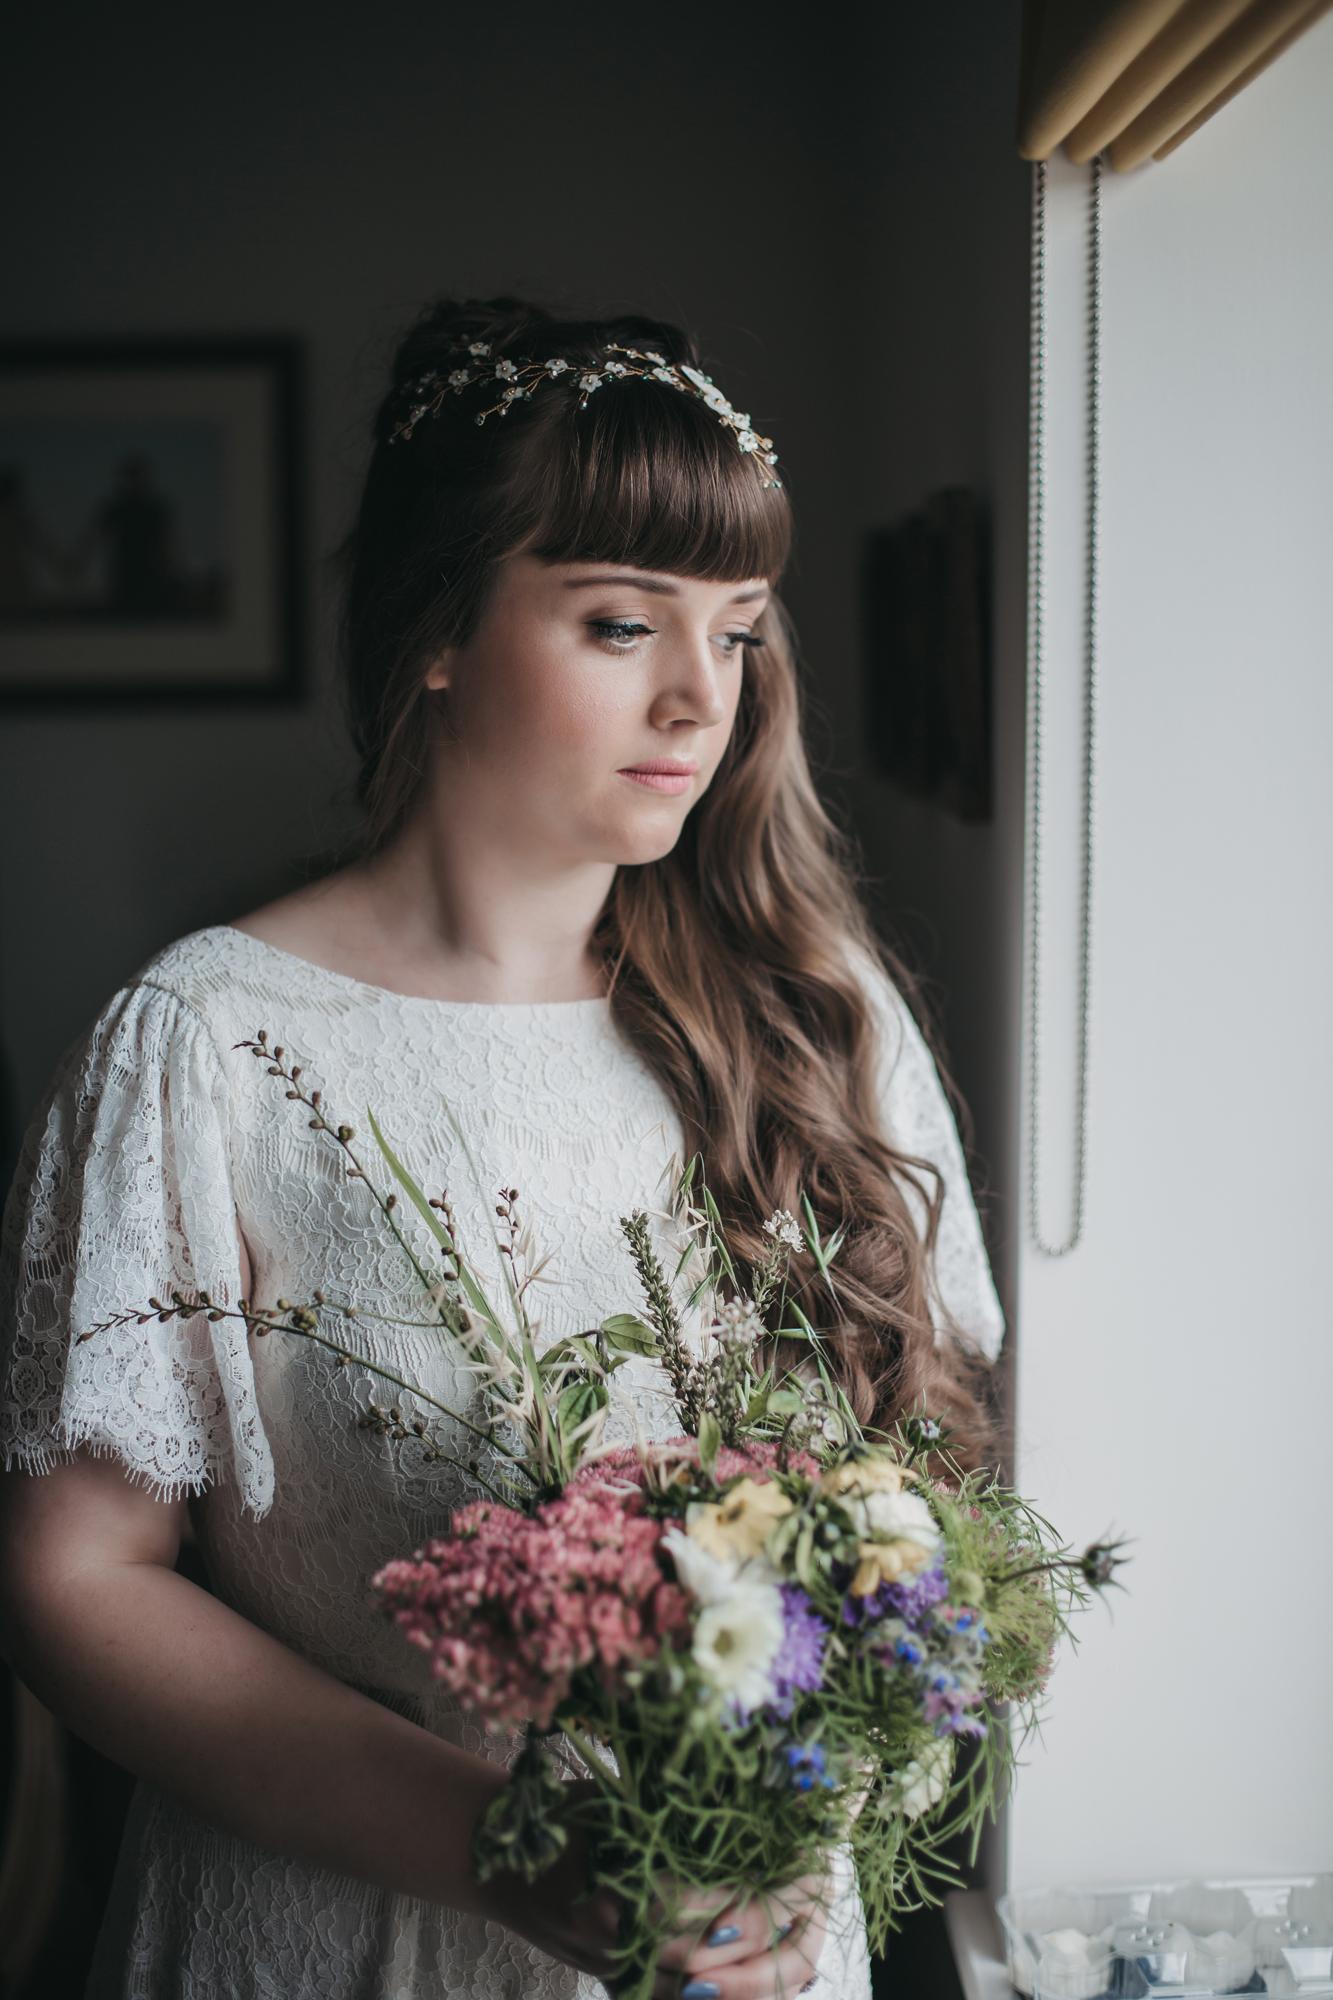 Kristy-Back-Garden-Outdoor-Wedding-Sheffield-Industrial-Warehouse-Wedding-Bohemian-Kate-Beaumont-Dahlia-Dress-5.jpg